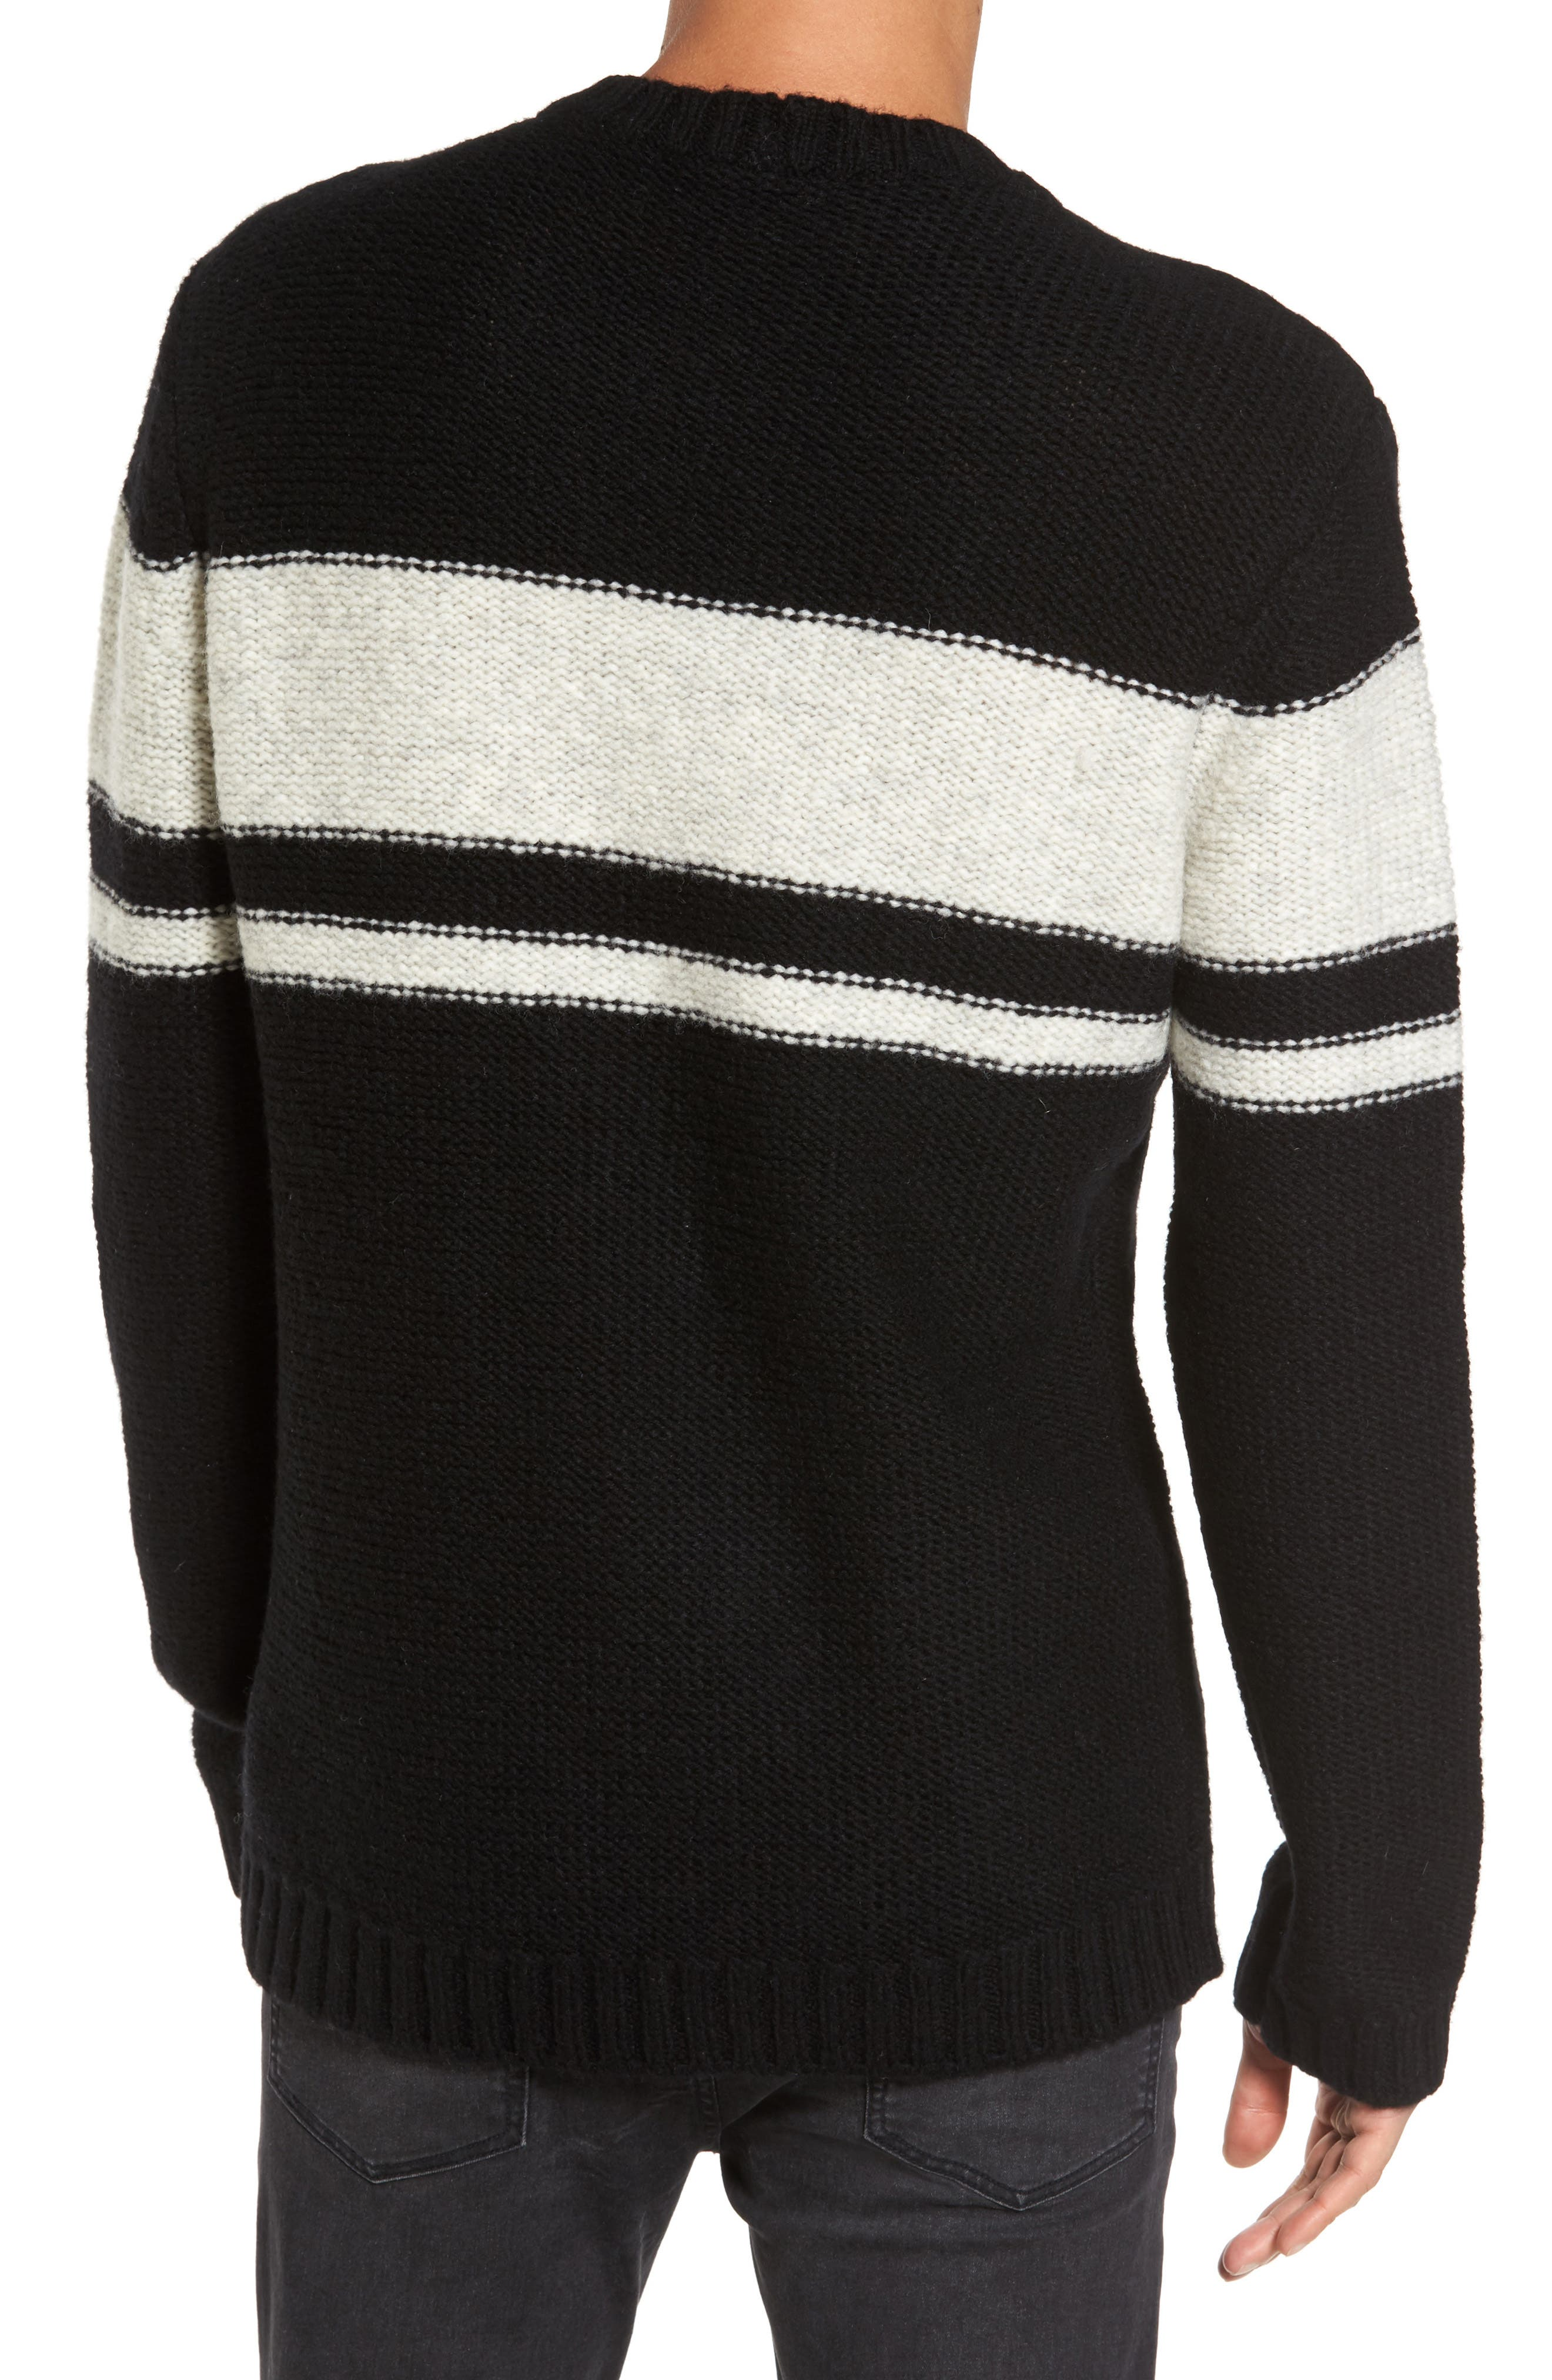 Blume Sweater,                             Alternate thumbnail 2, color,                             001